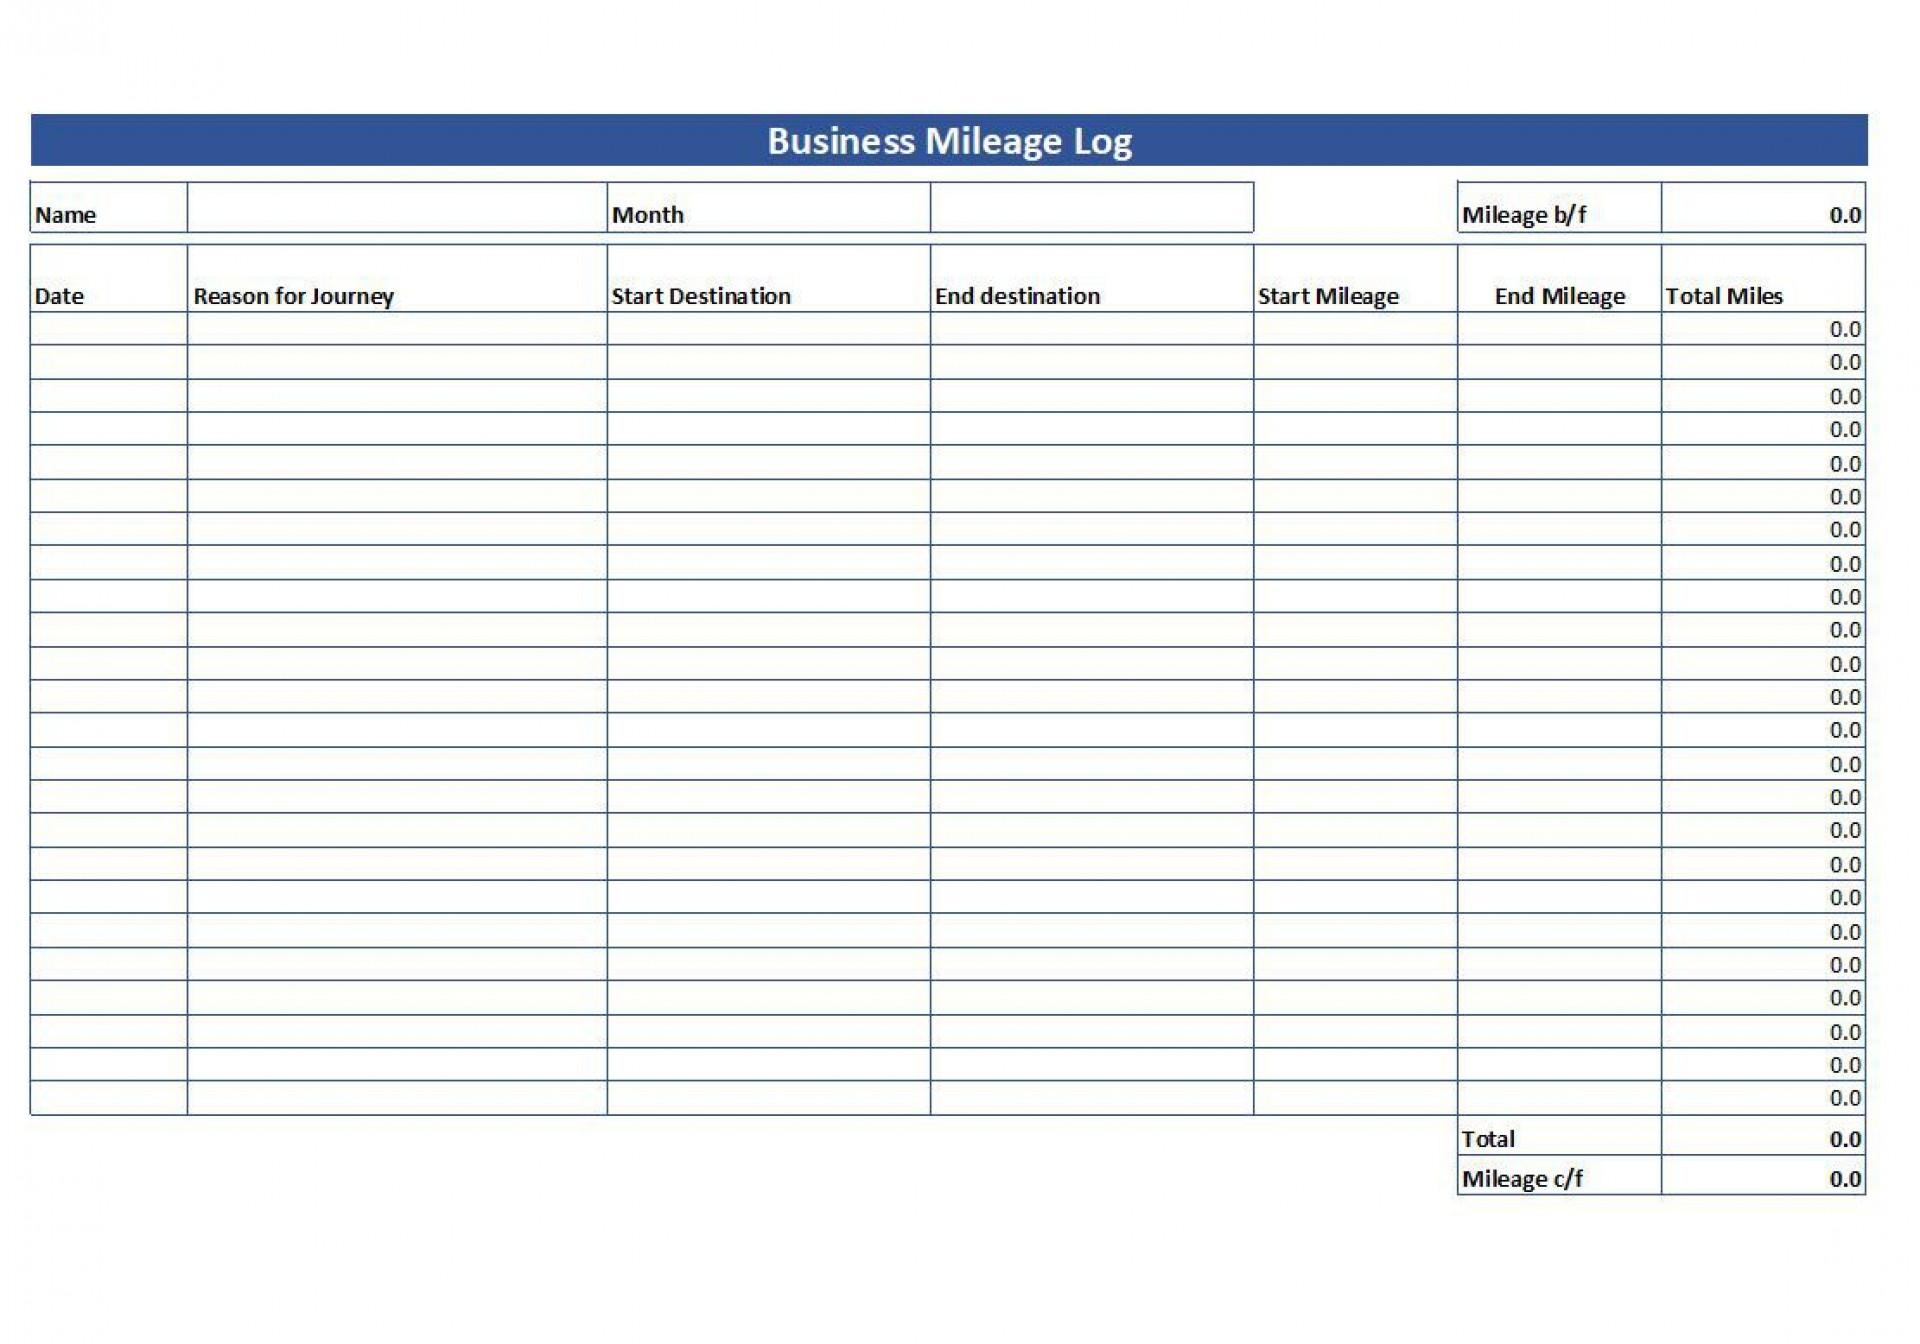 008 Wonderful Mileage Log Printable Template Sample  Book Excel1920